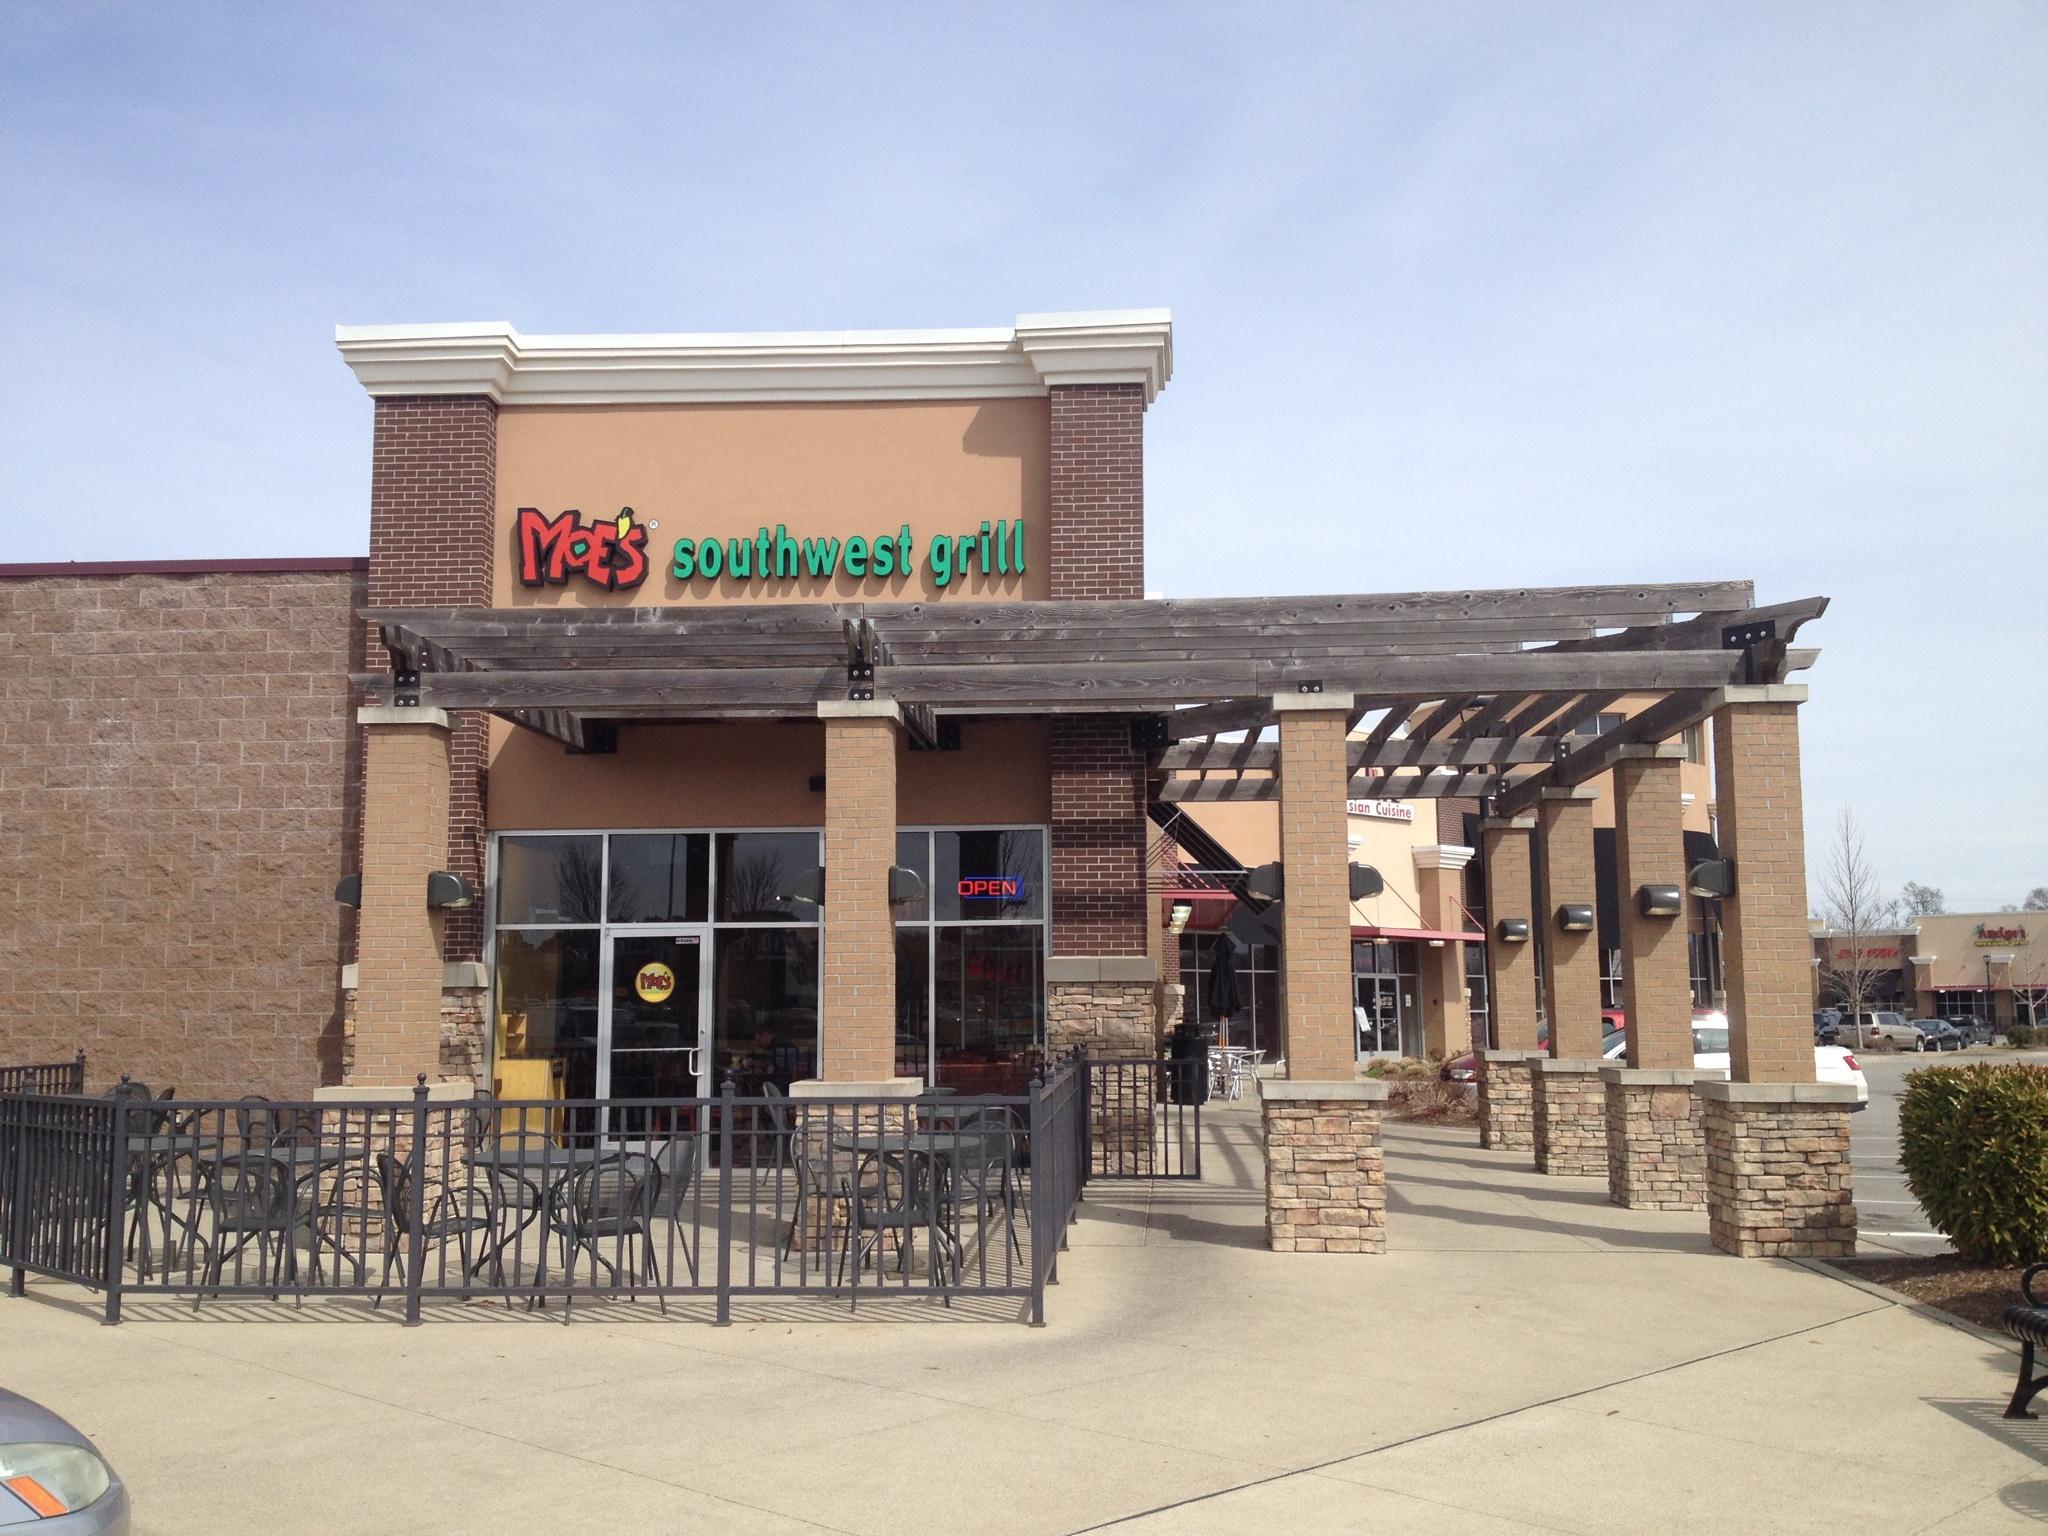 Moe's Southwest Grill in Spring Hill, TN